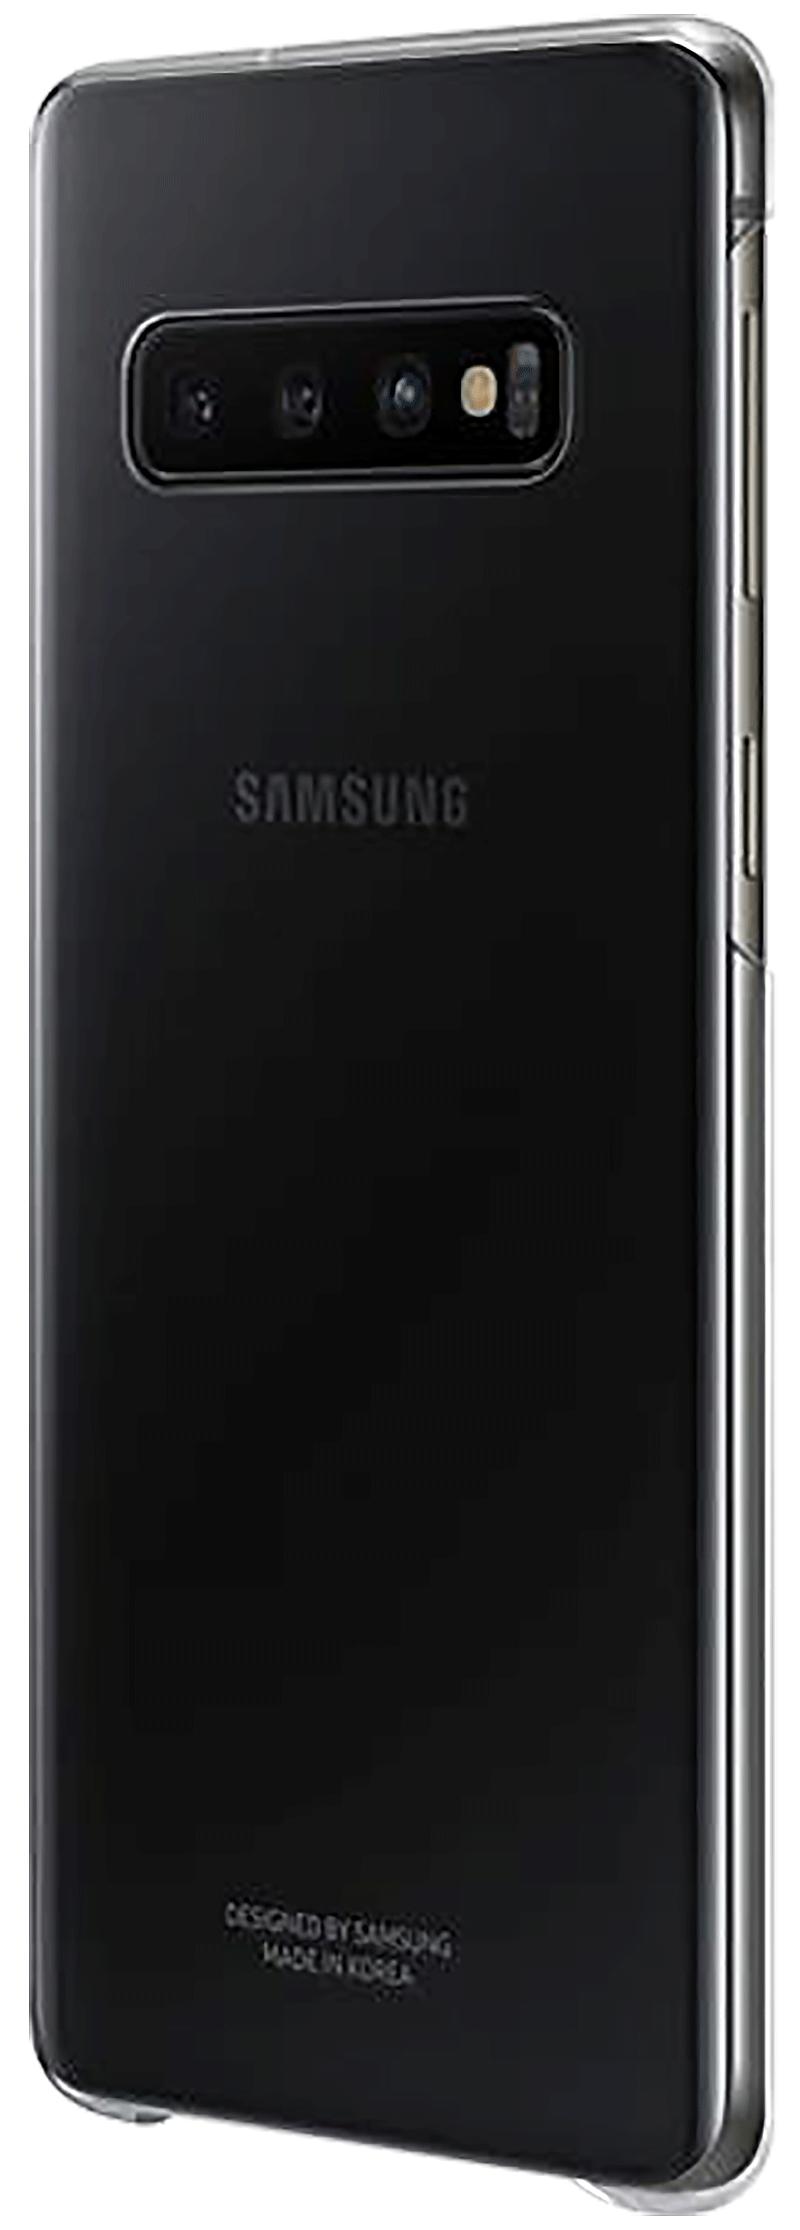 Coque Galaxy S10 transparente